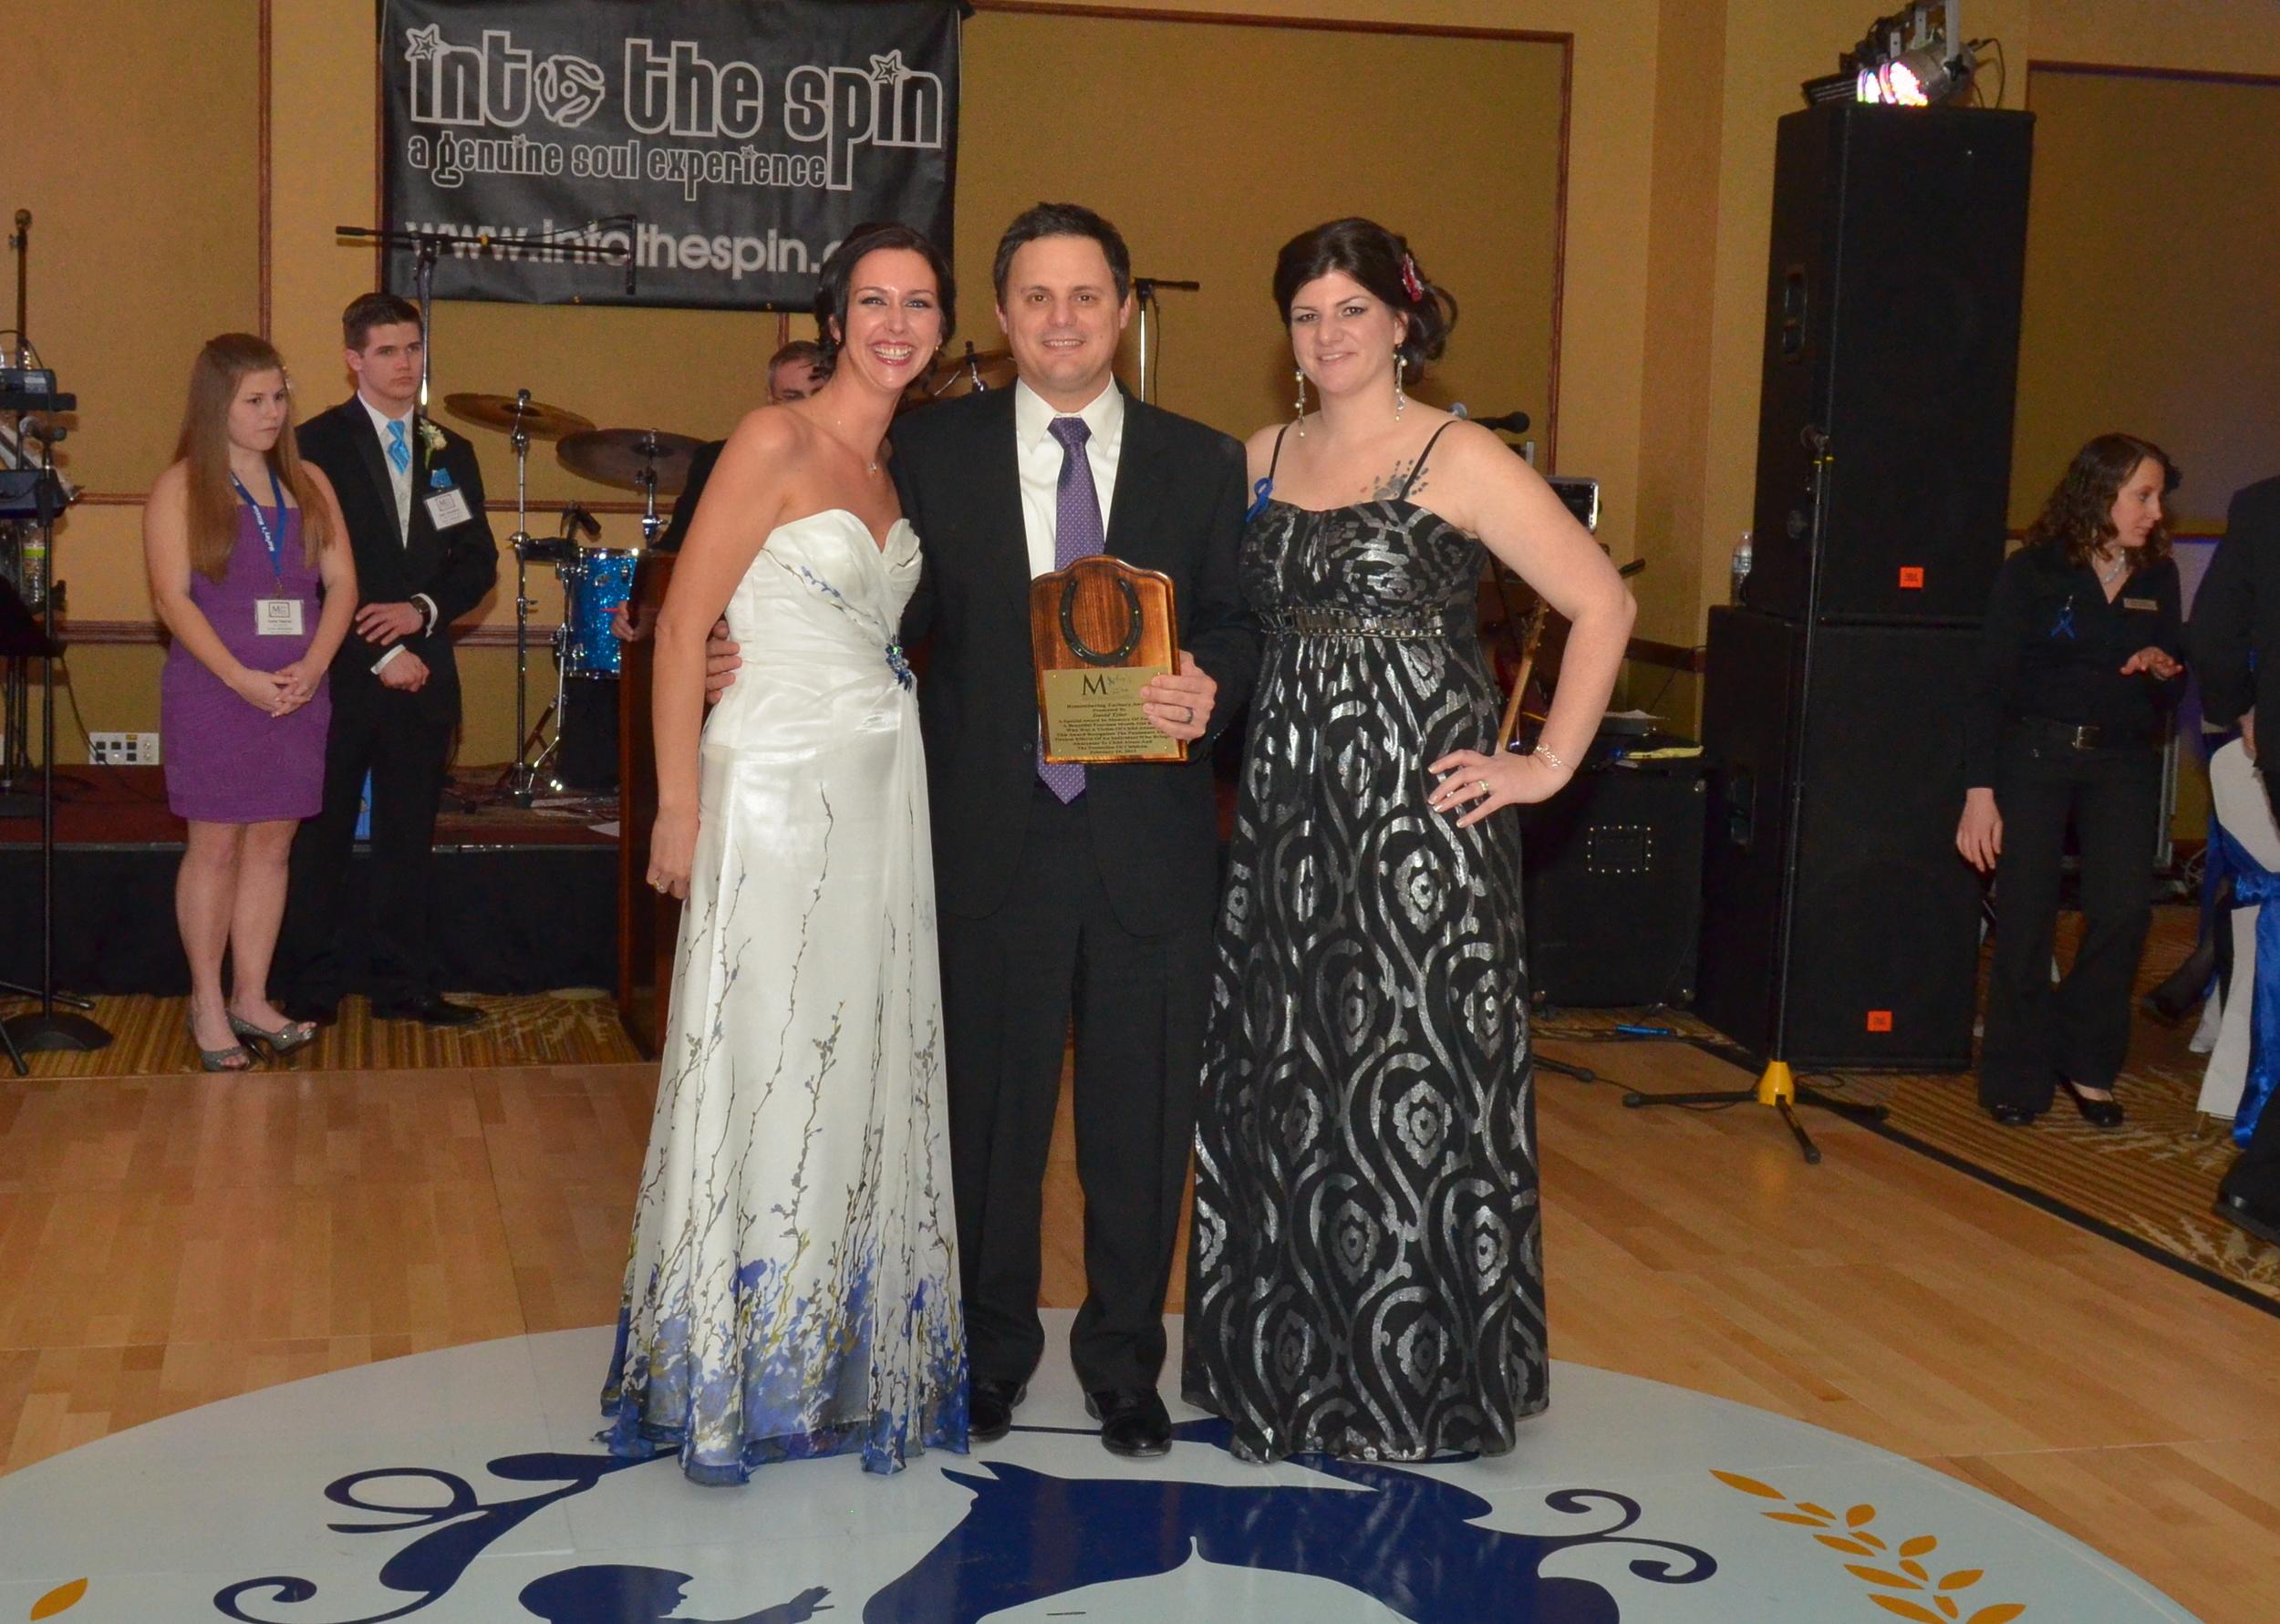 2013 Award Recipient